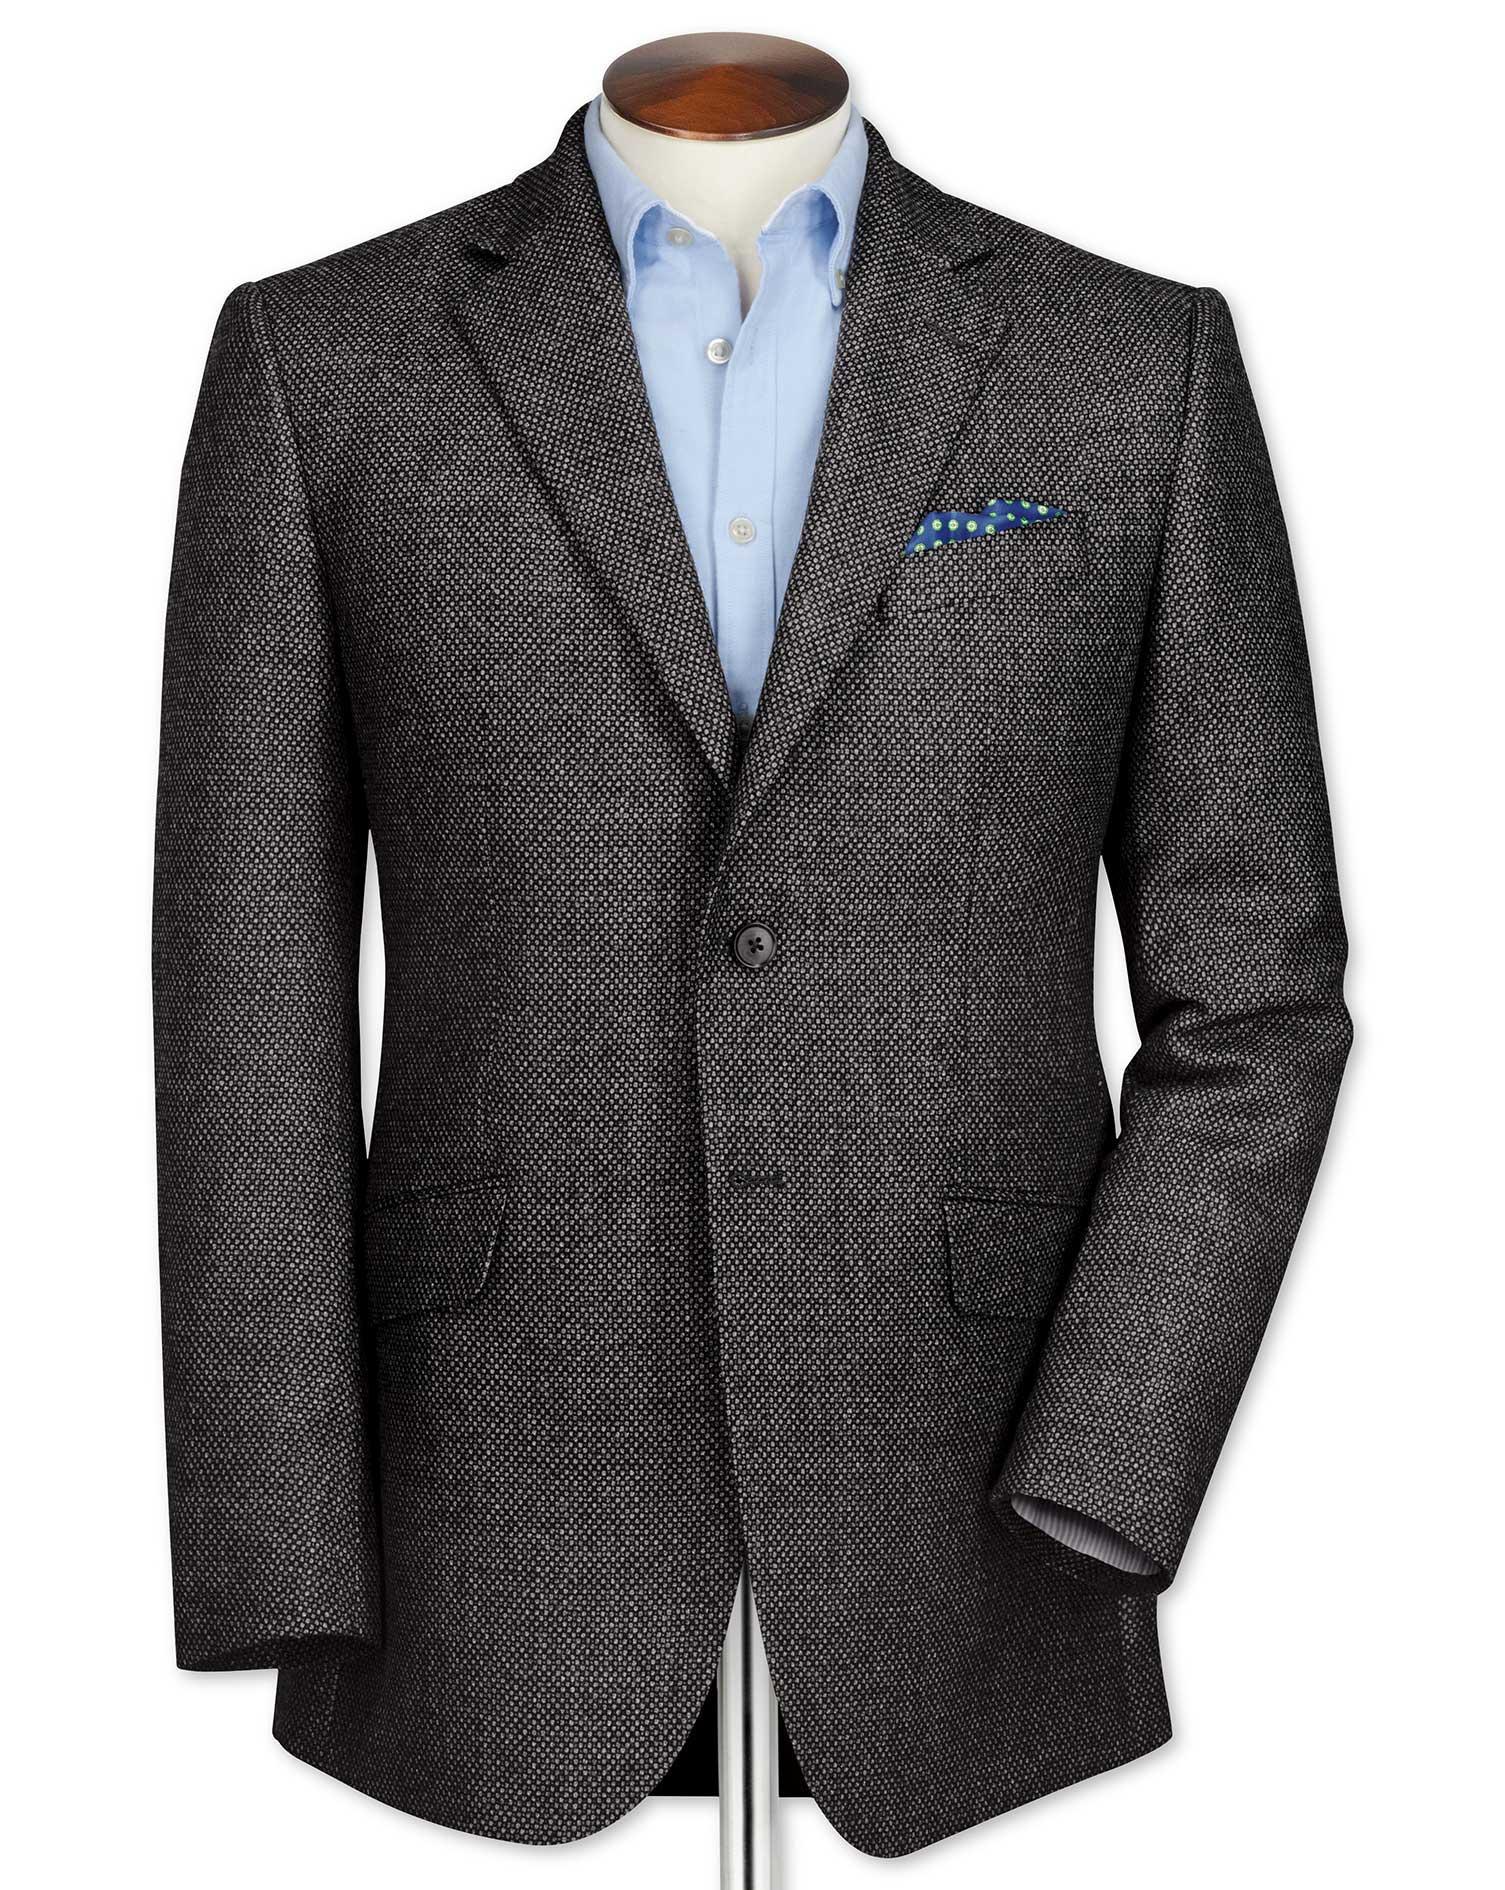 Classic Fit Grey Birdseye Lambswool Wool Jacket Size 42 Regular by Charles Tyrwhitt